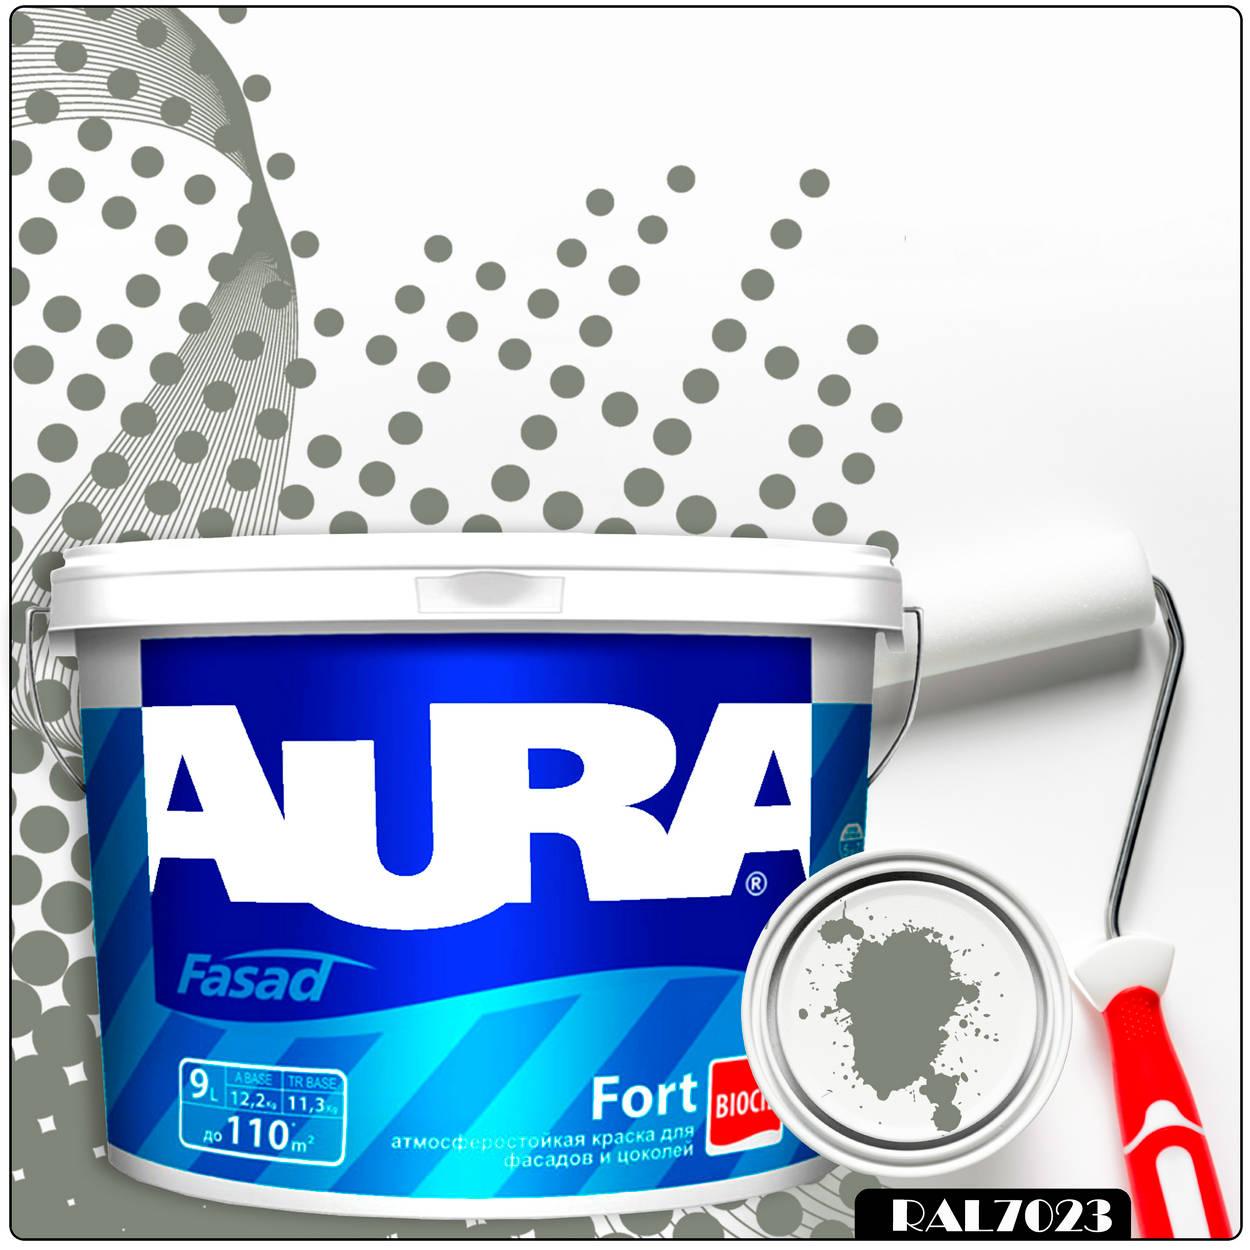 Фото 17 - Краска Aura Fasad Fort, RAL 7023 Серый бетон, латексная, матовая, для фасада и цоколей, 9л, Аура.